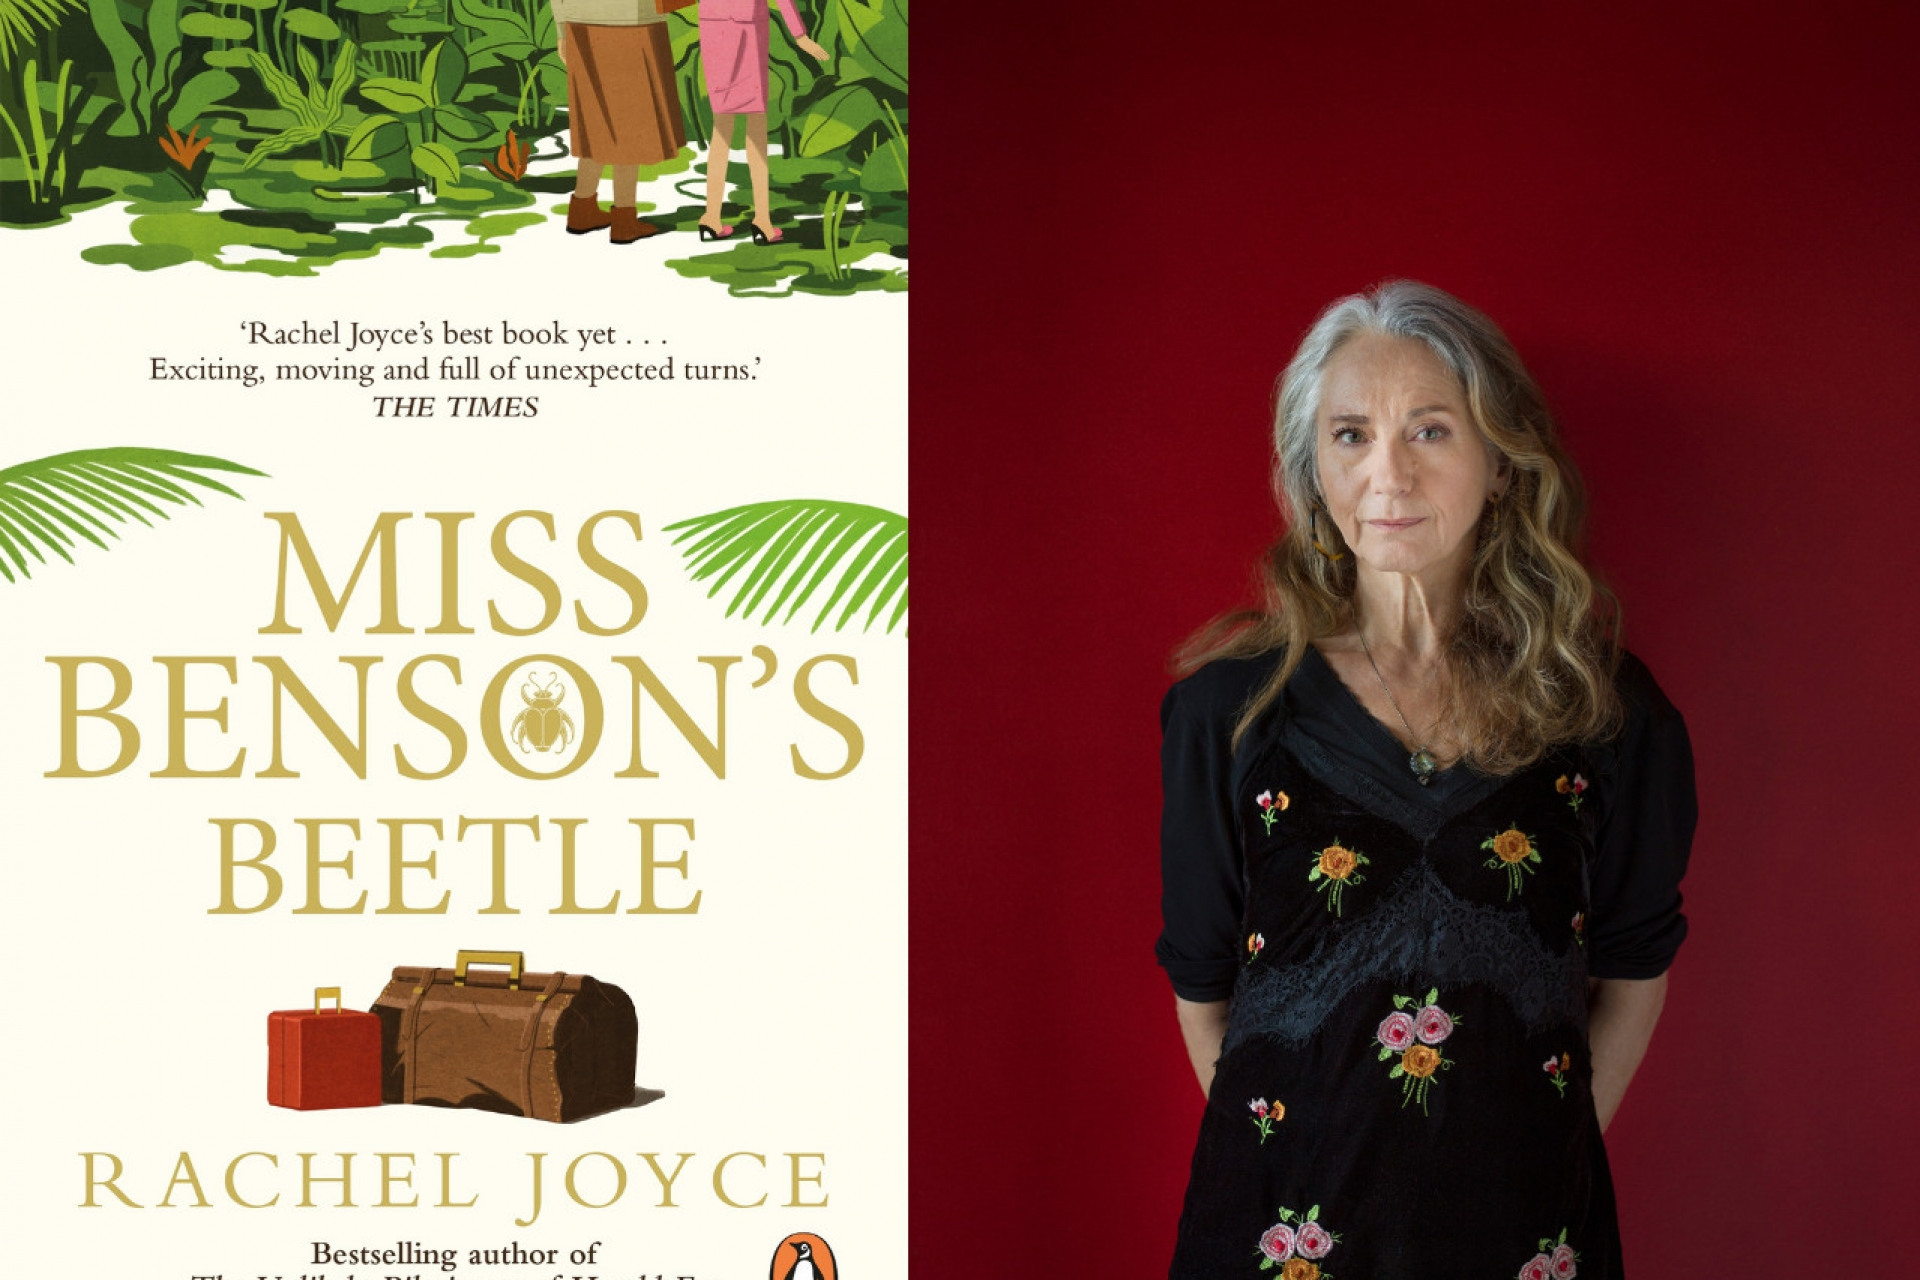 Miss Benson's Beetle takes home Wilbur Smith Adventure Writing Prize